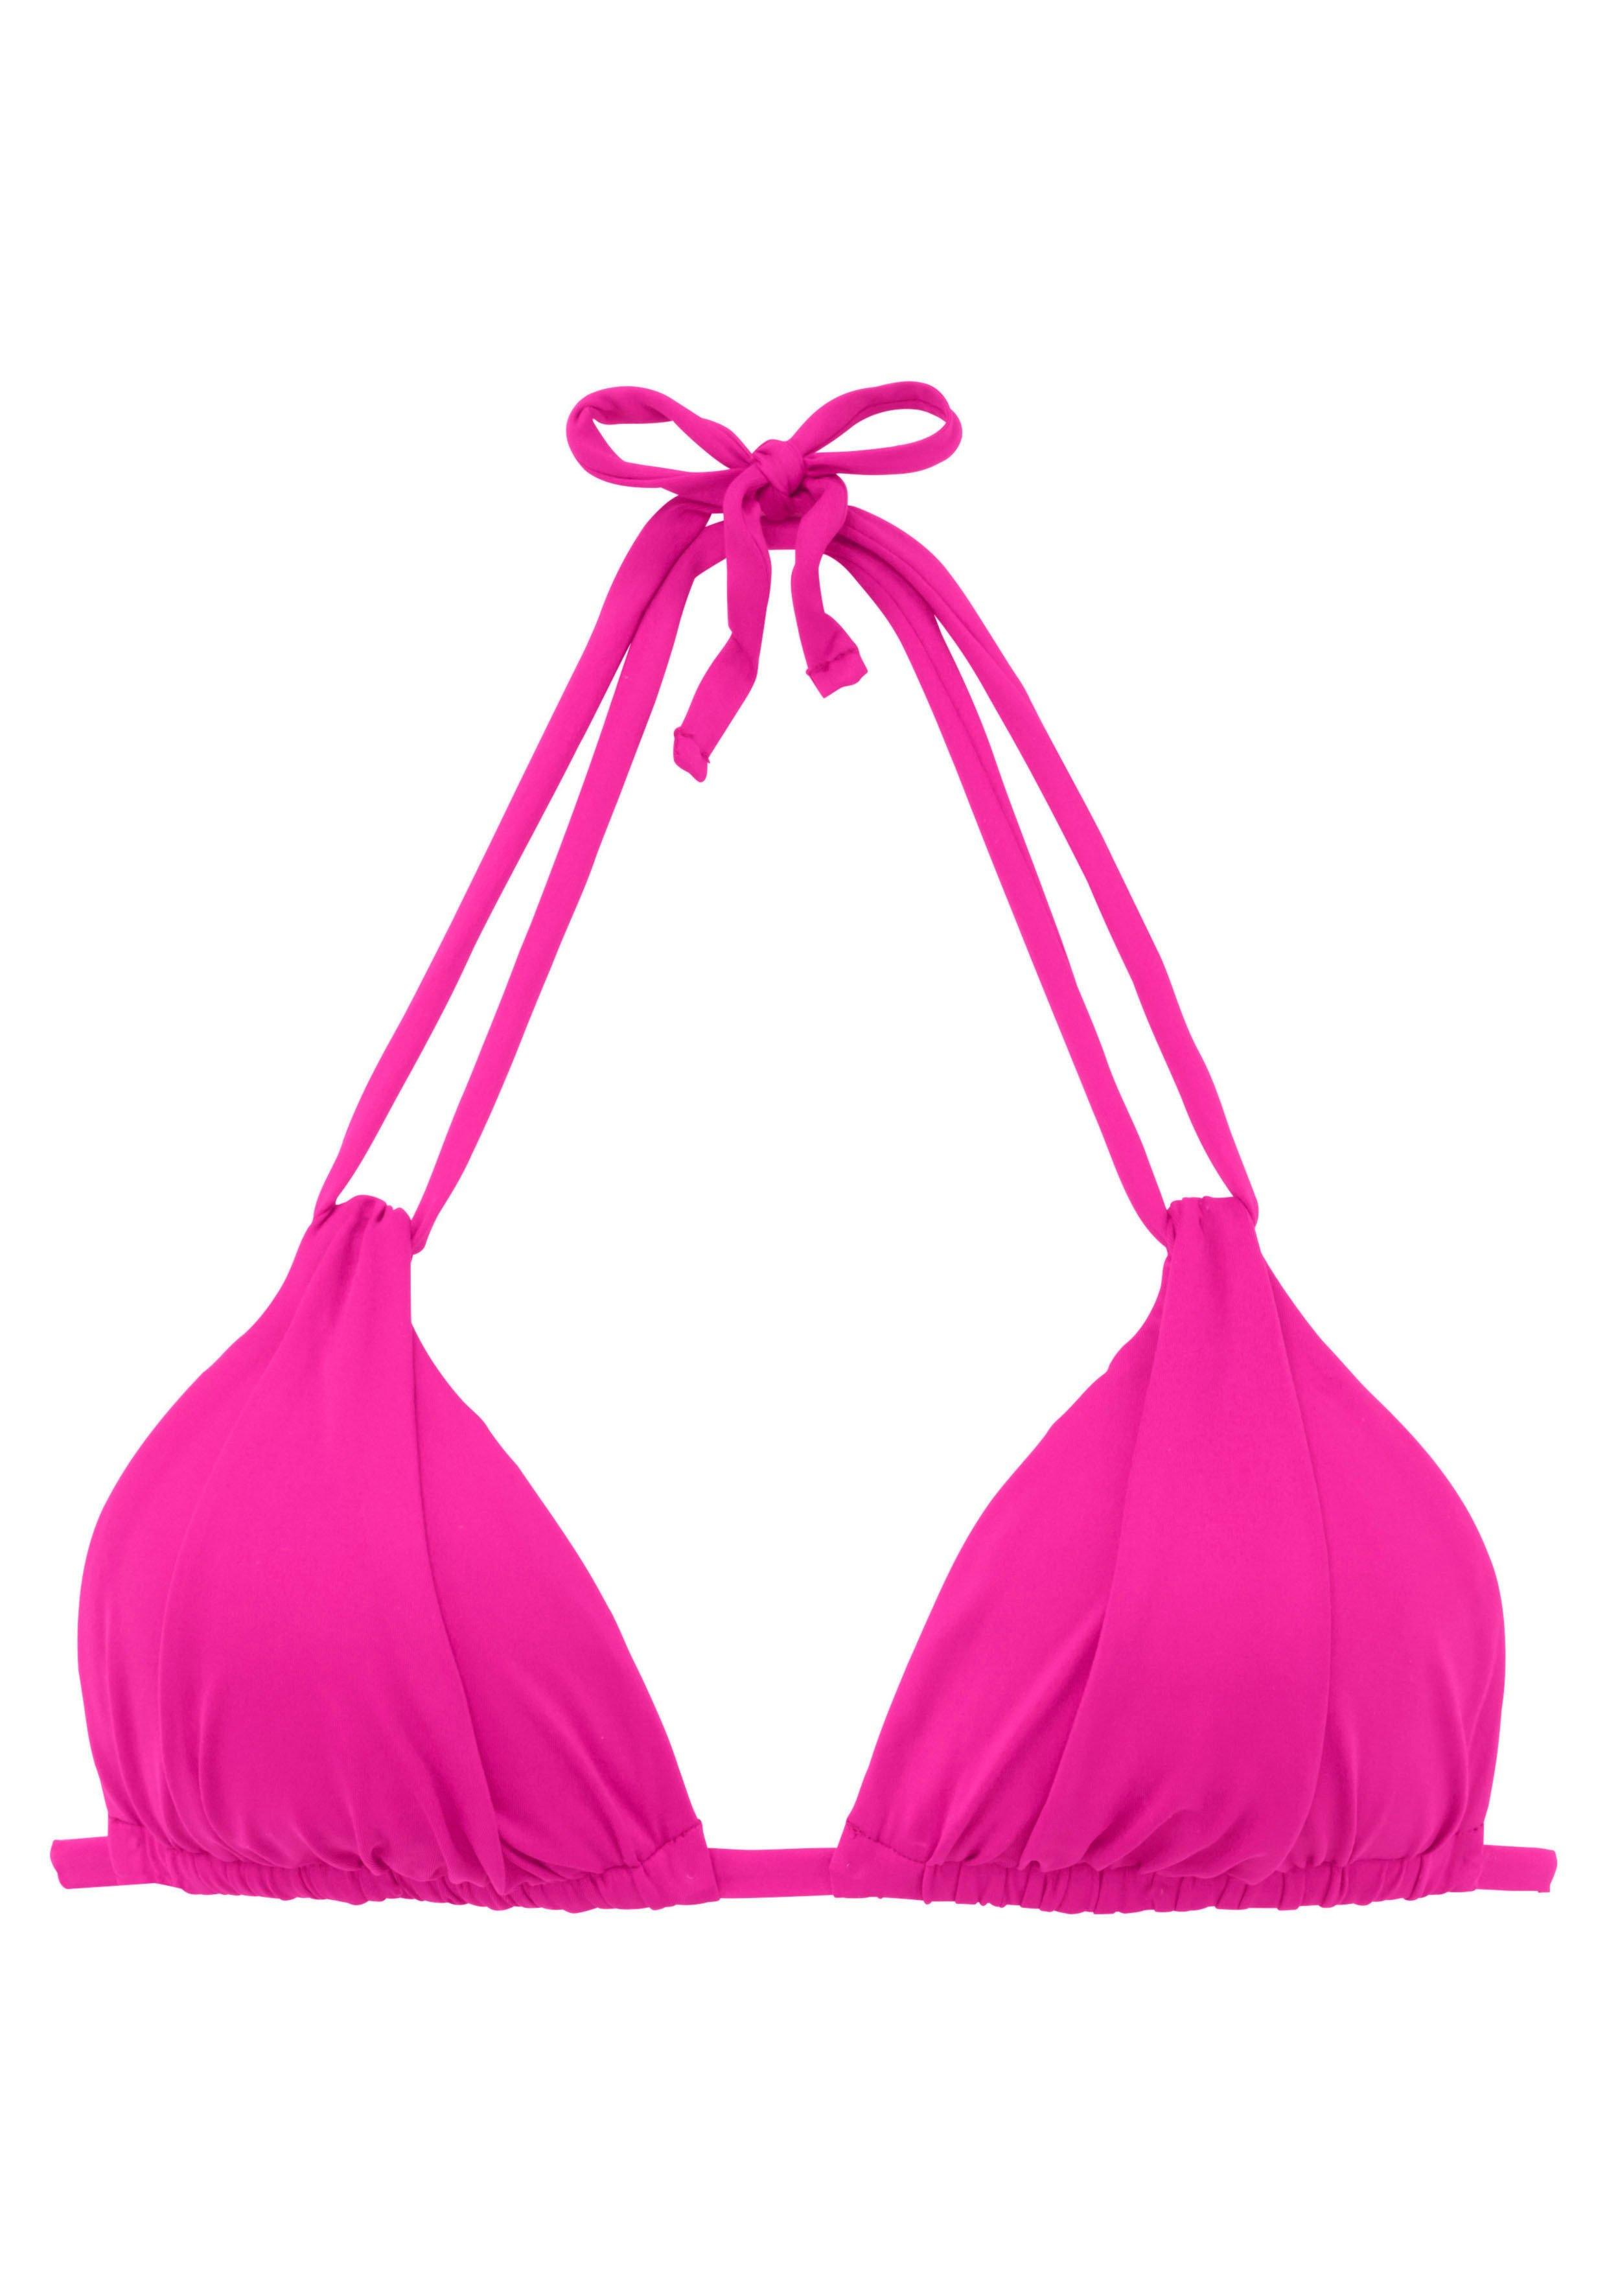 s.Oliver RED LABEL Beachwear triangel-bikinitop Spain met plooi en dubbele bandjes nu online kopen bij OTTO